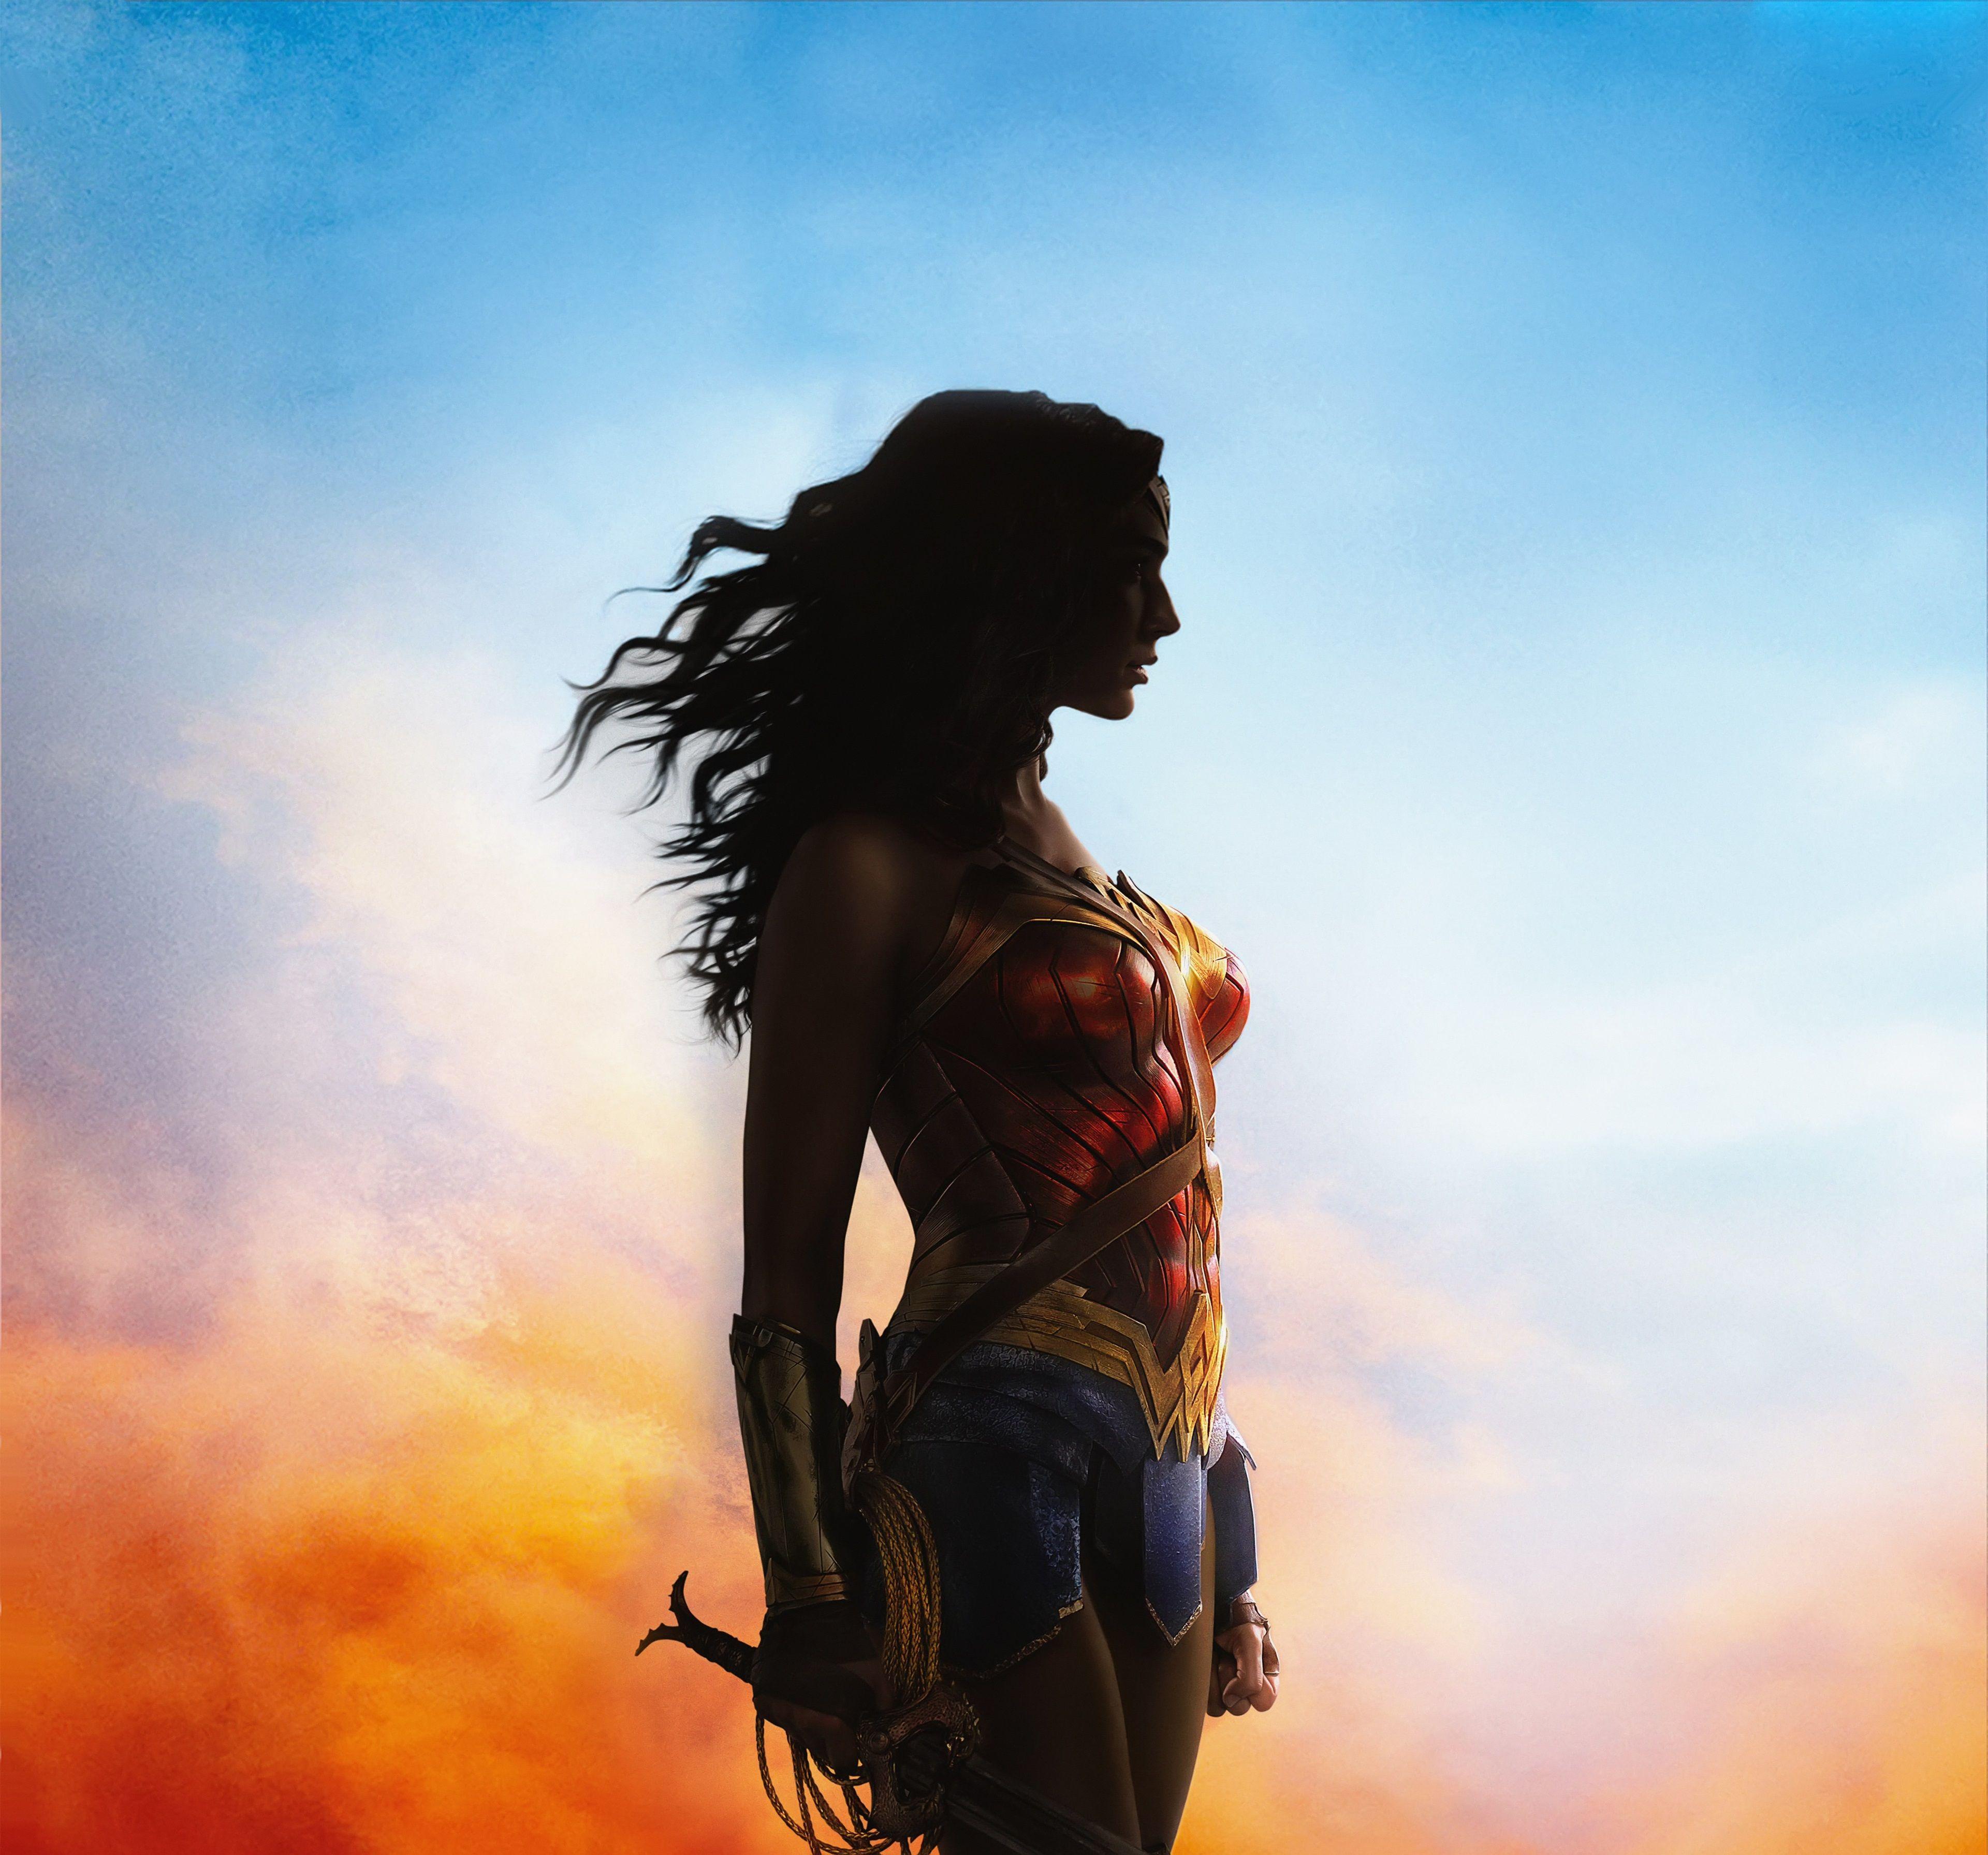 3840x3583 Wonder Woman 4k High Defination Wallpaper Gal Gadot Wonder Woman Wonder Woman Justice League Wonder Woman